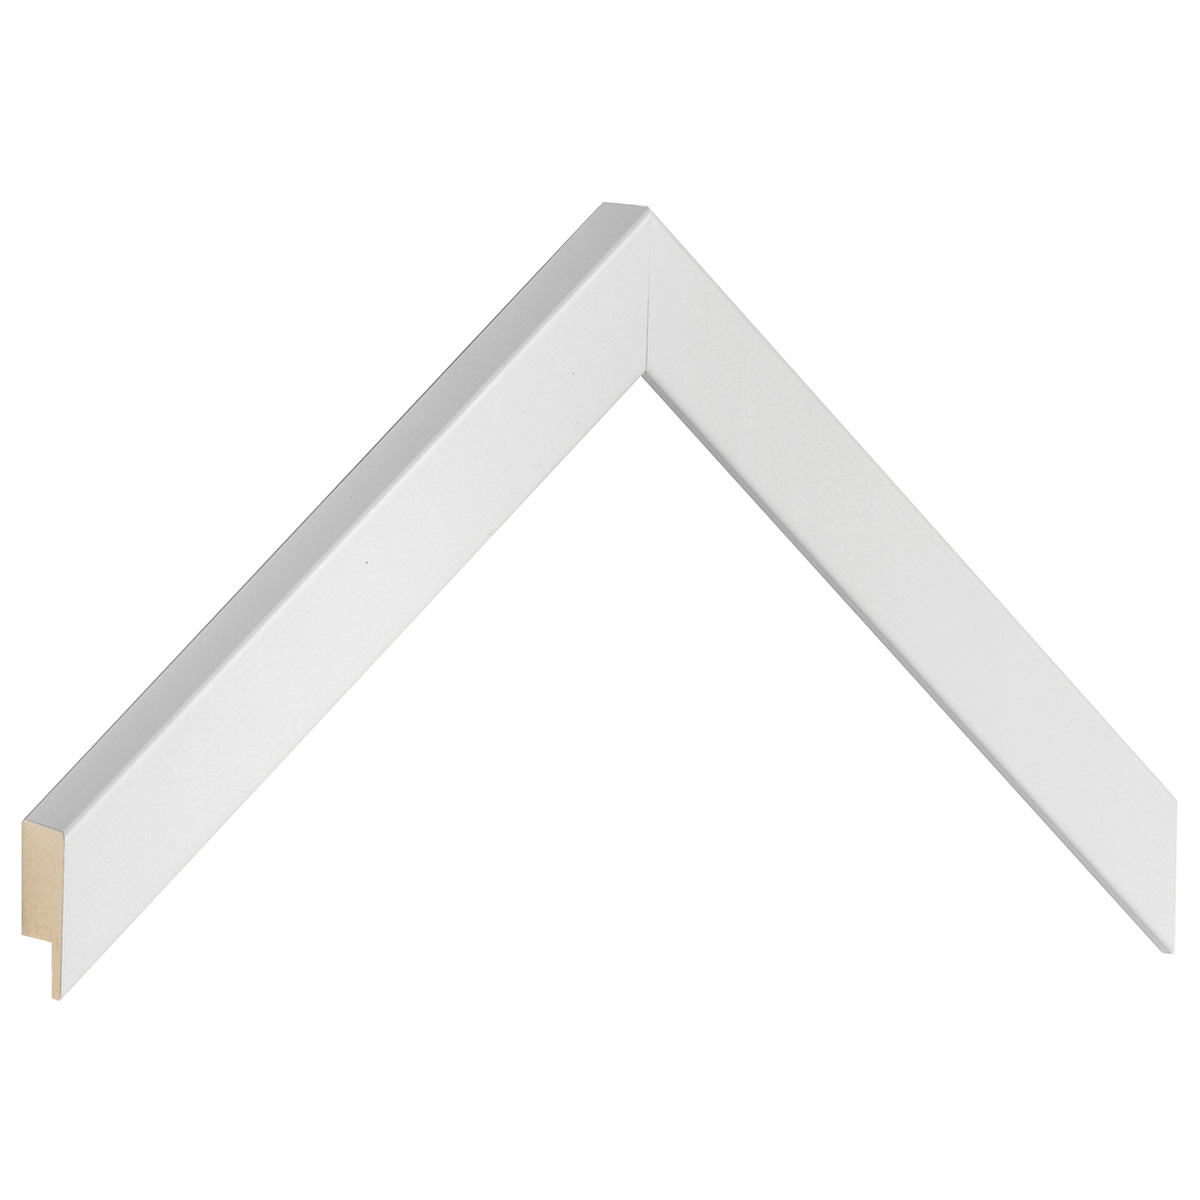 Moulding ayous, width 20mm height 20 - White, matt